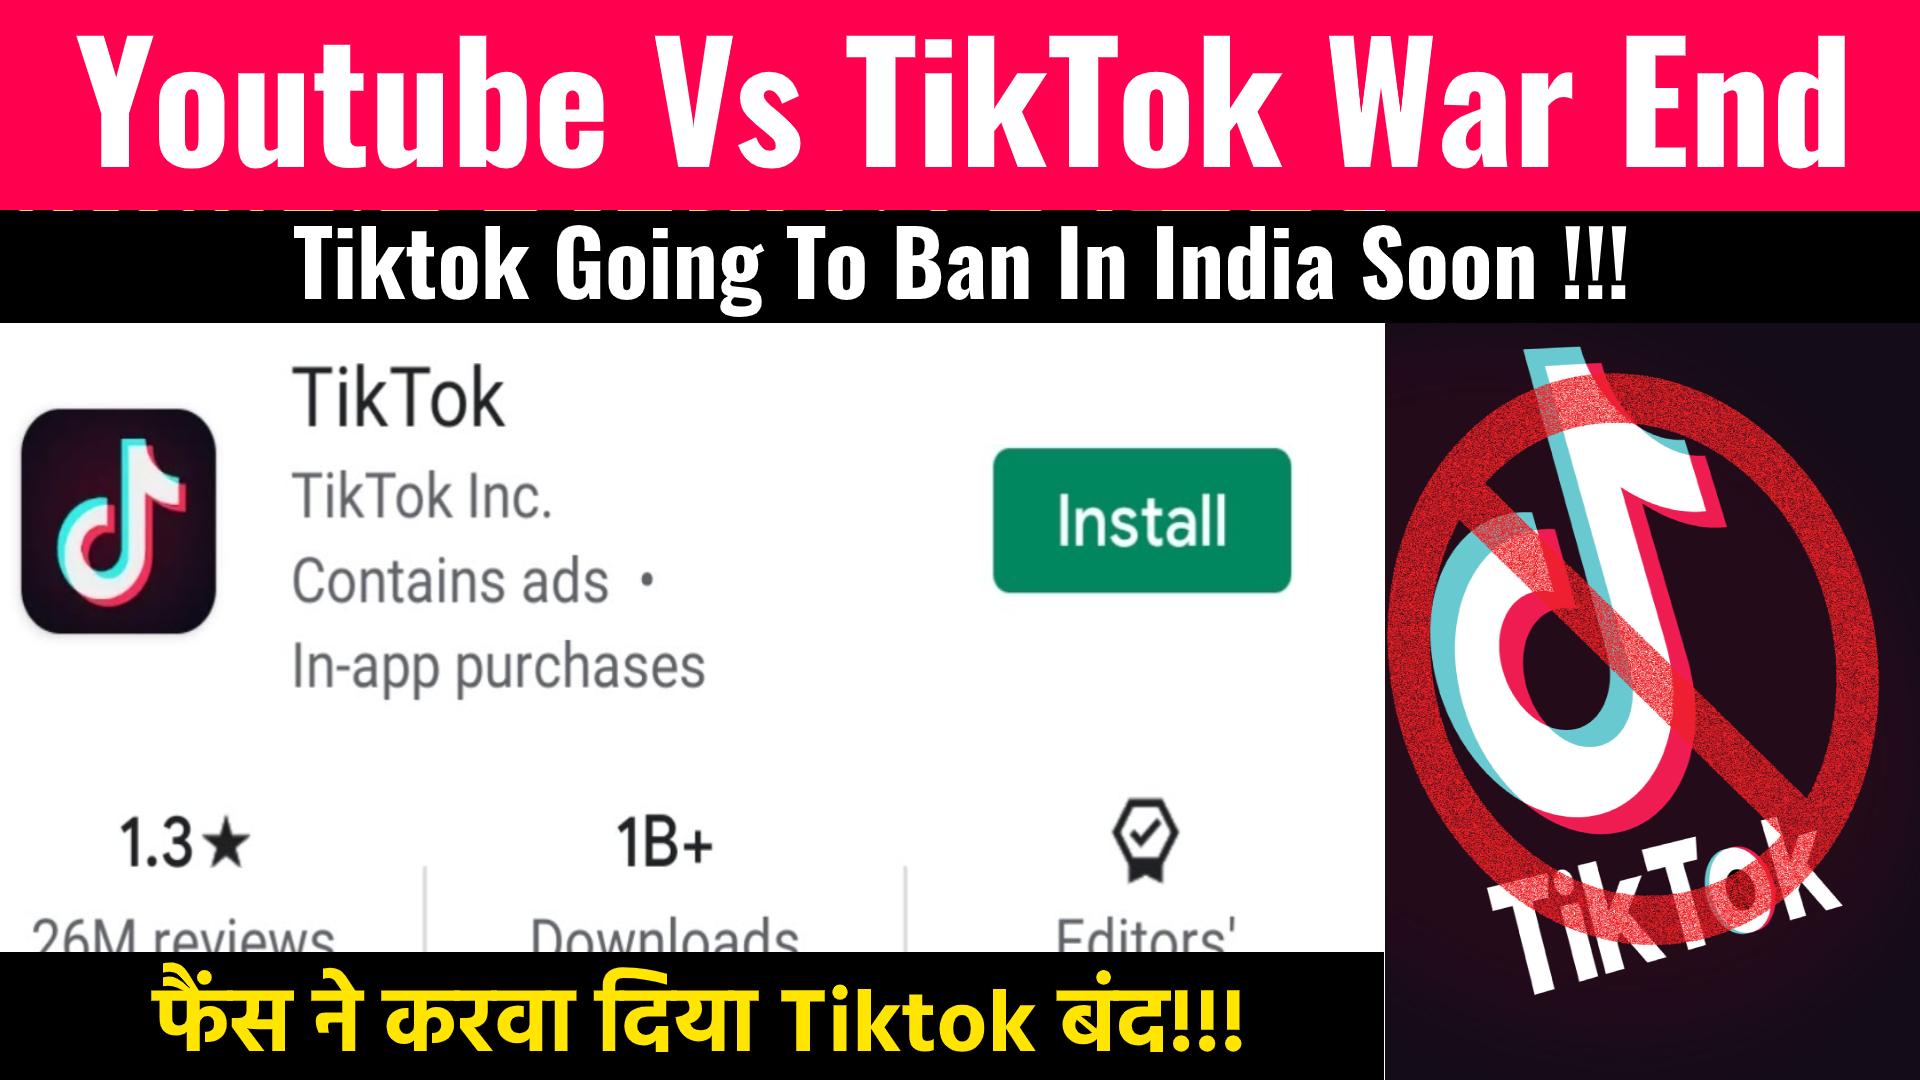 Youtube Vs Tiktok Tiktok Ban In India Youtube Banned Ads